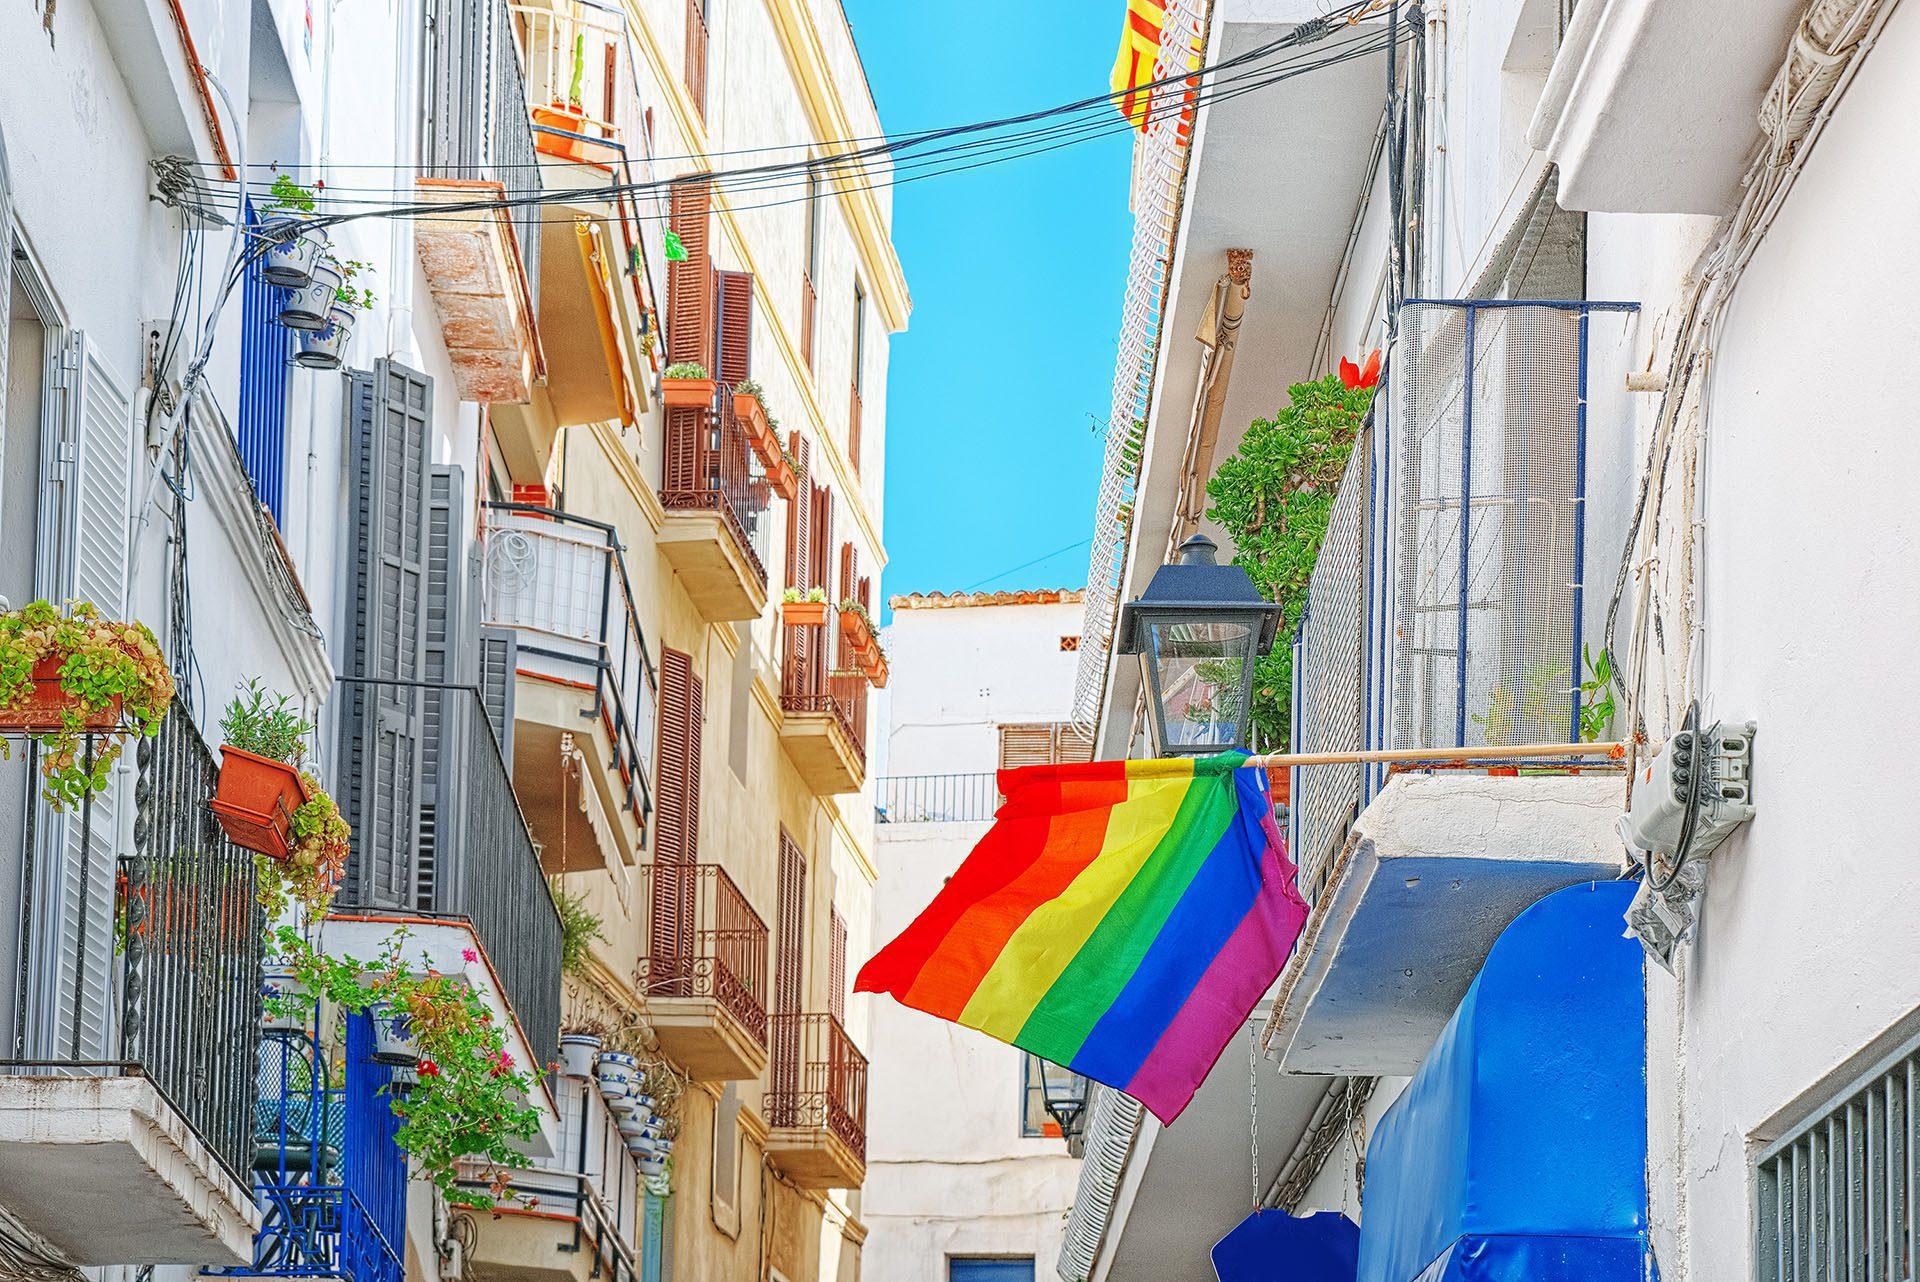 Visite gay de Sitges